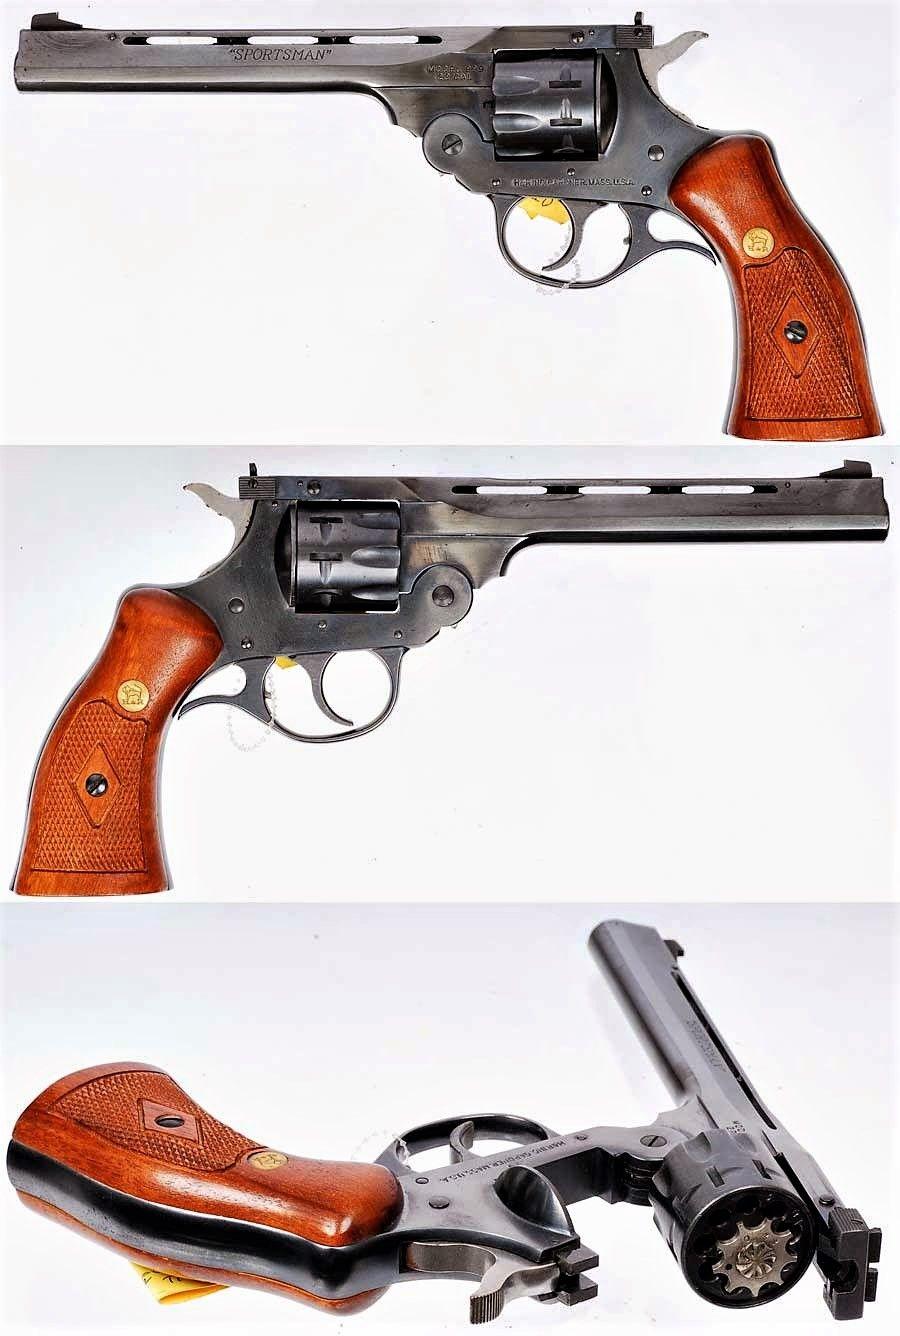 H&R 999 Sportsman - .22 9-Shot revolver | Pew Pew | Revolver pistol